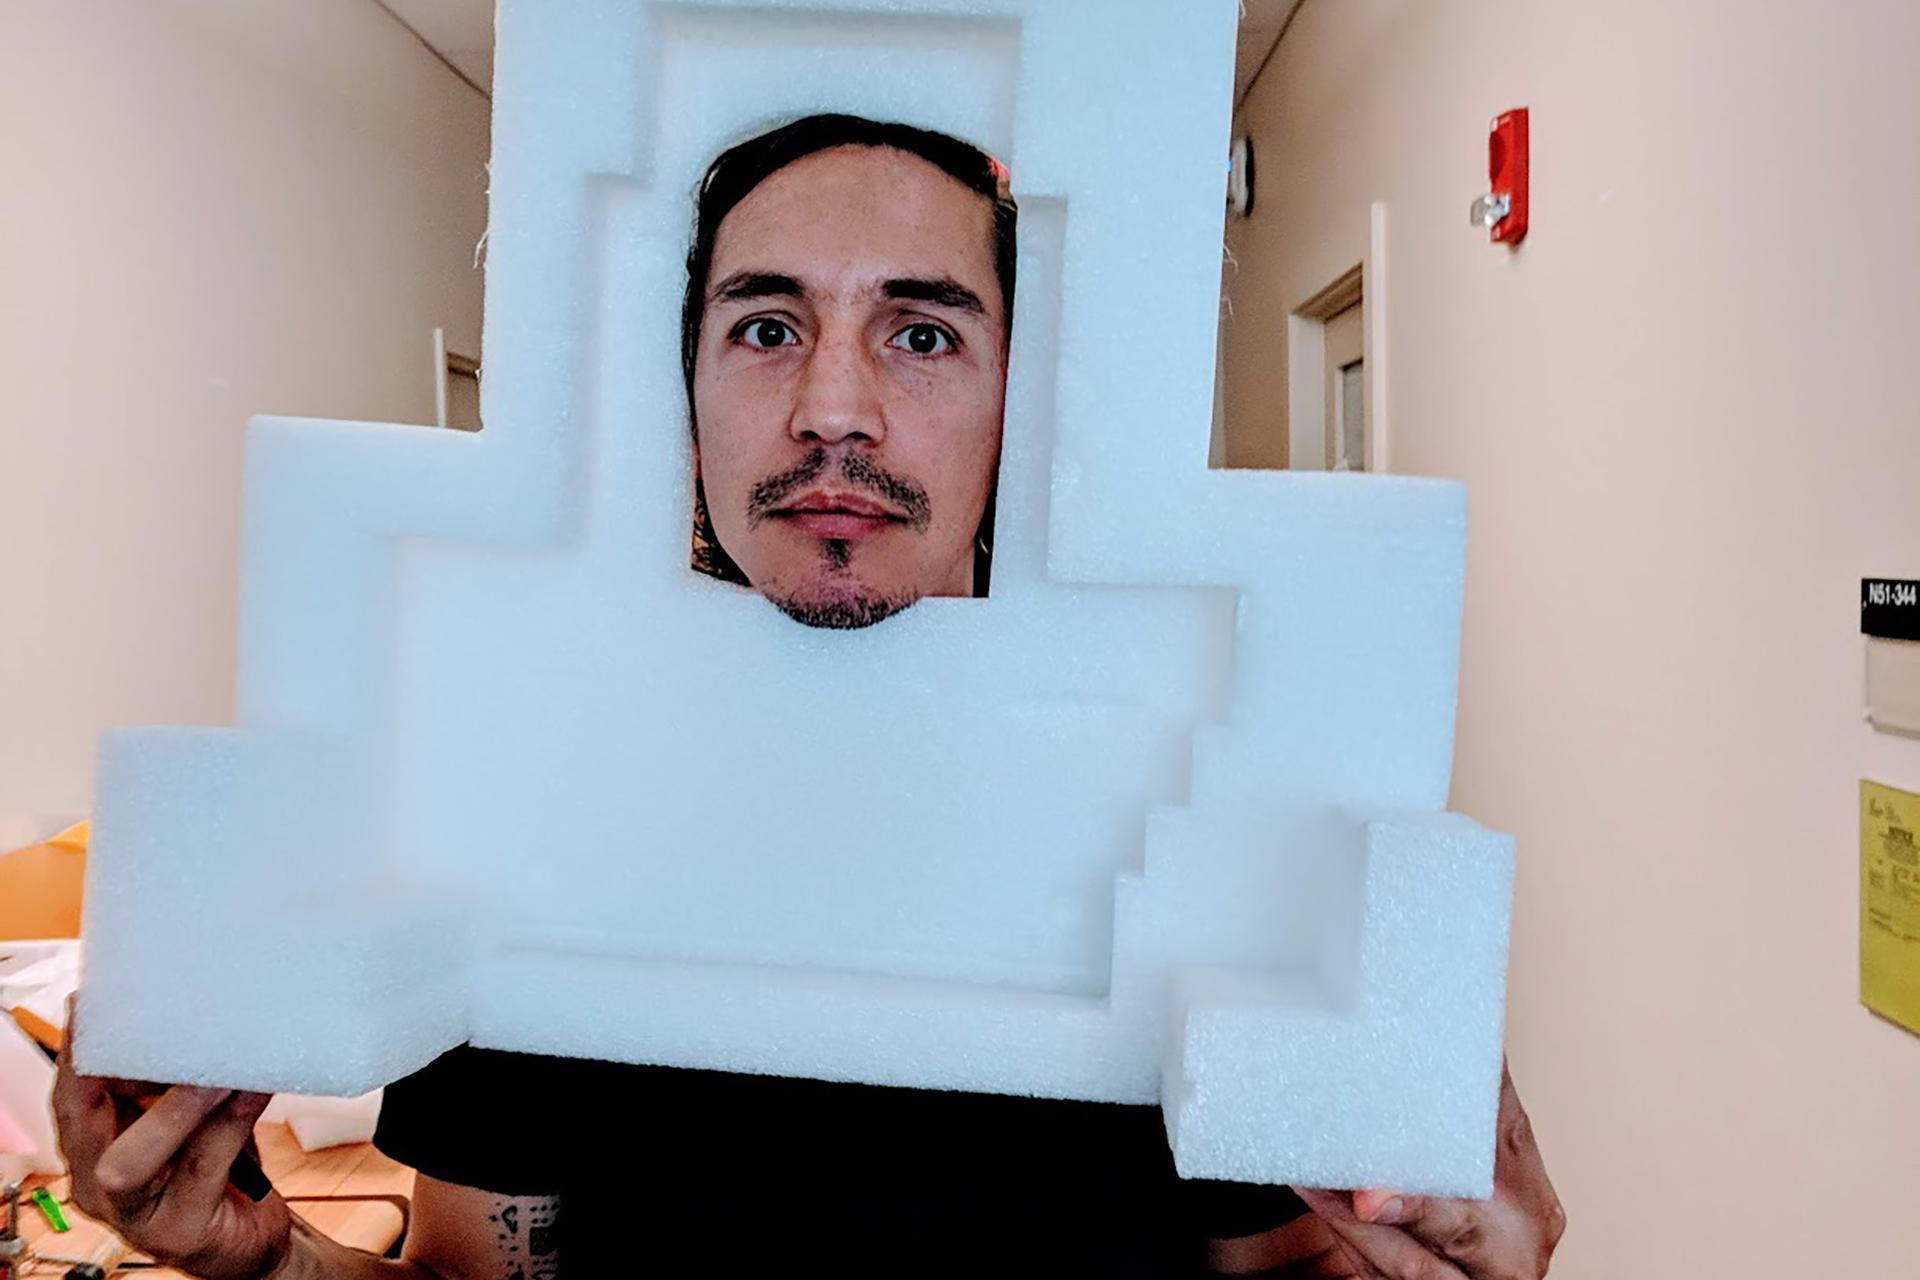 IDM student with their face peeking through a piece of styrofoam